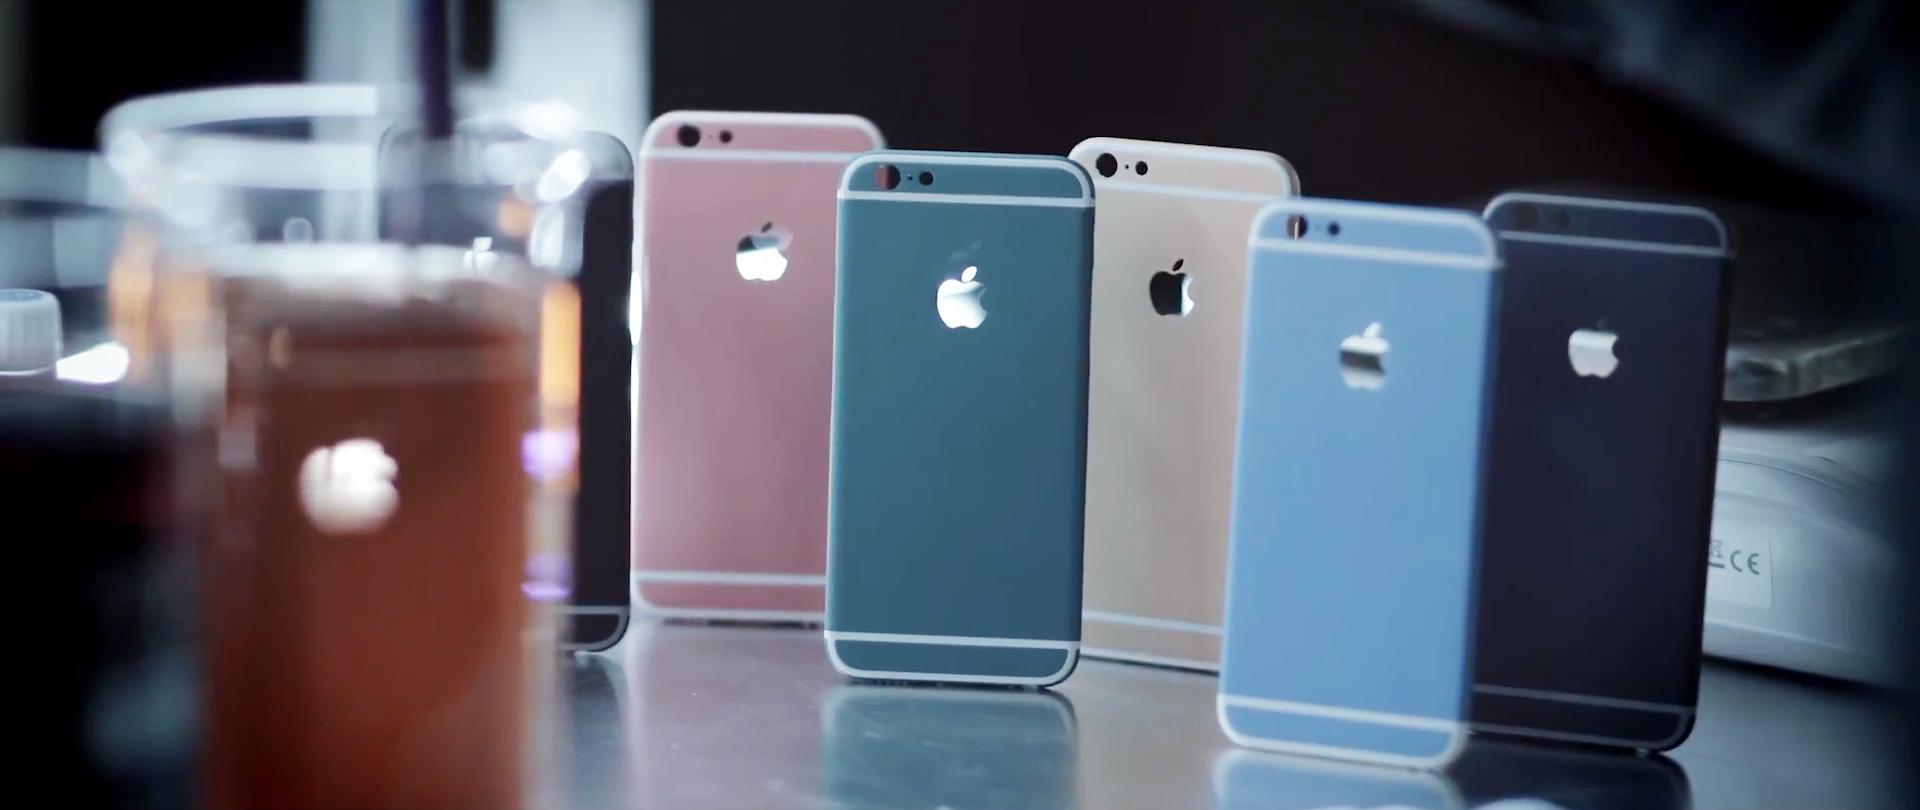 Odnowiony iPhone - iPhone refurbished w Polsce